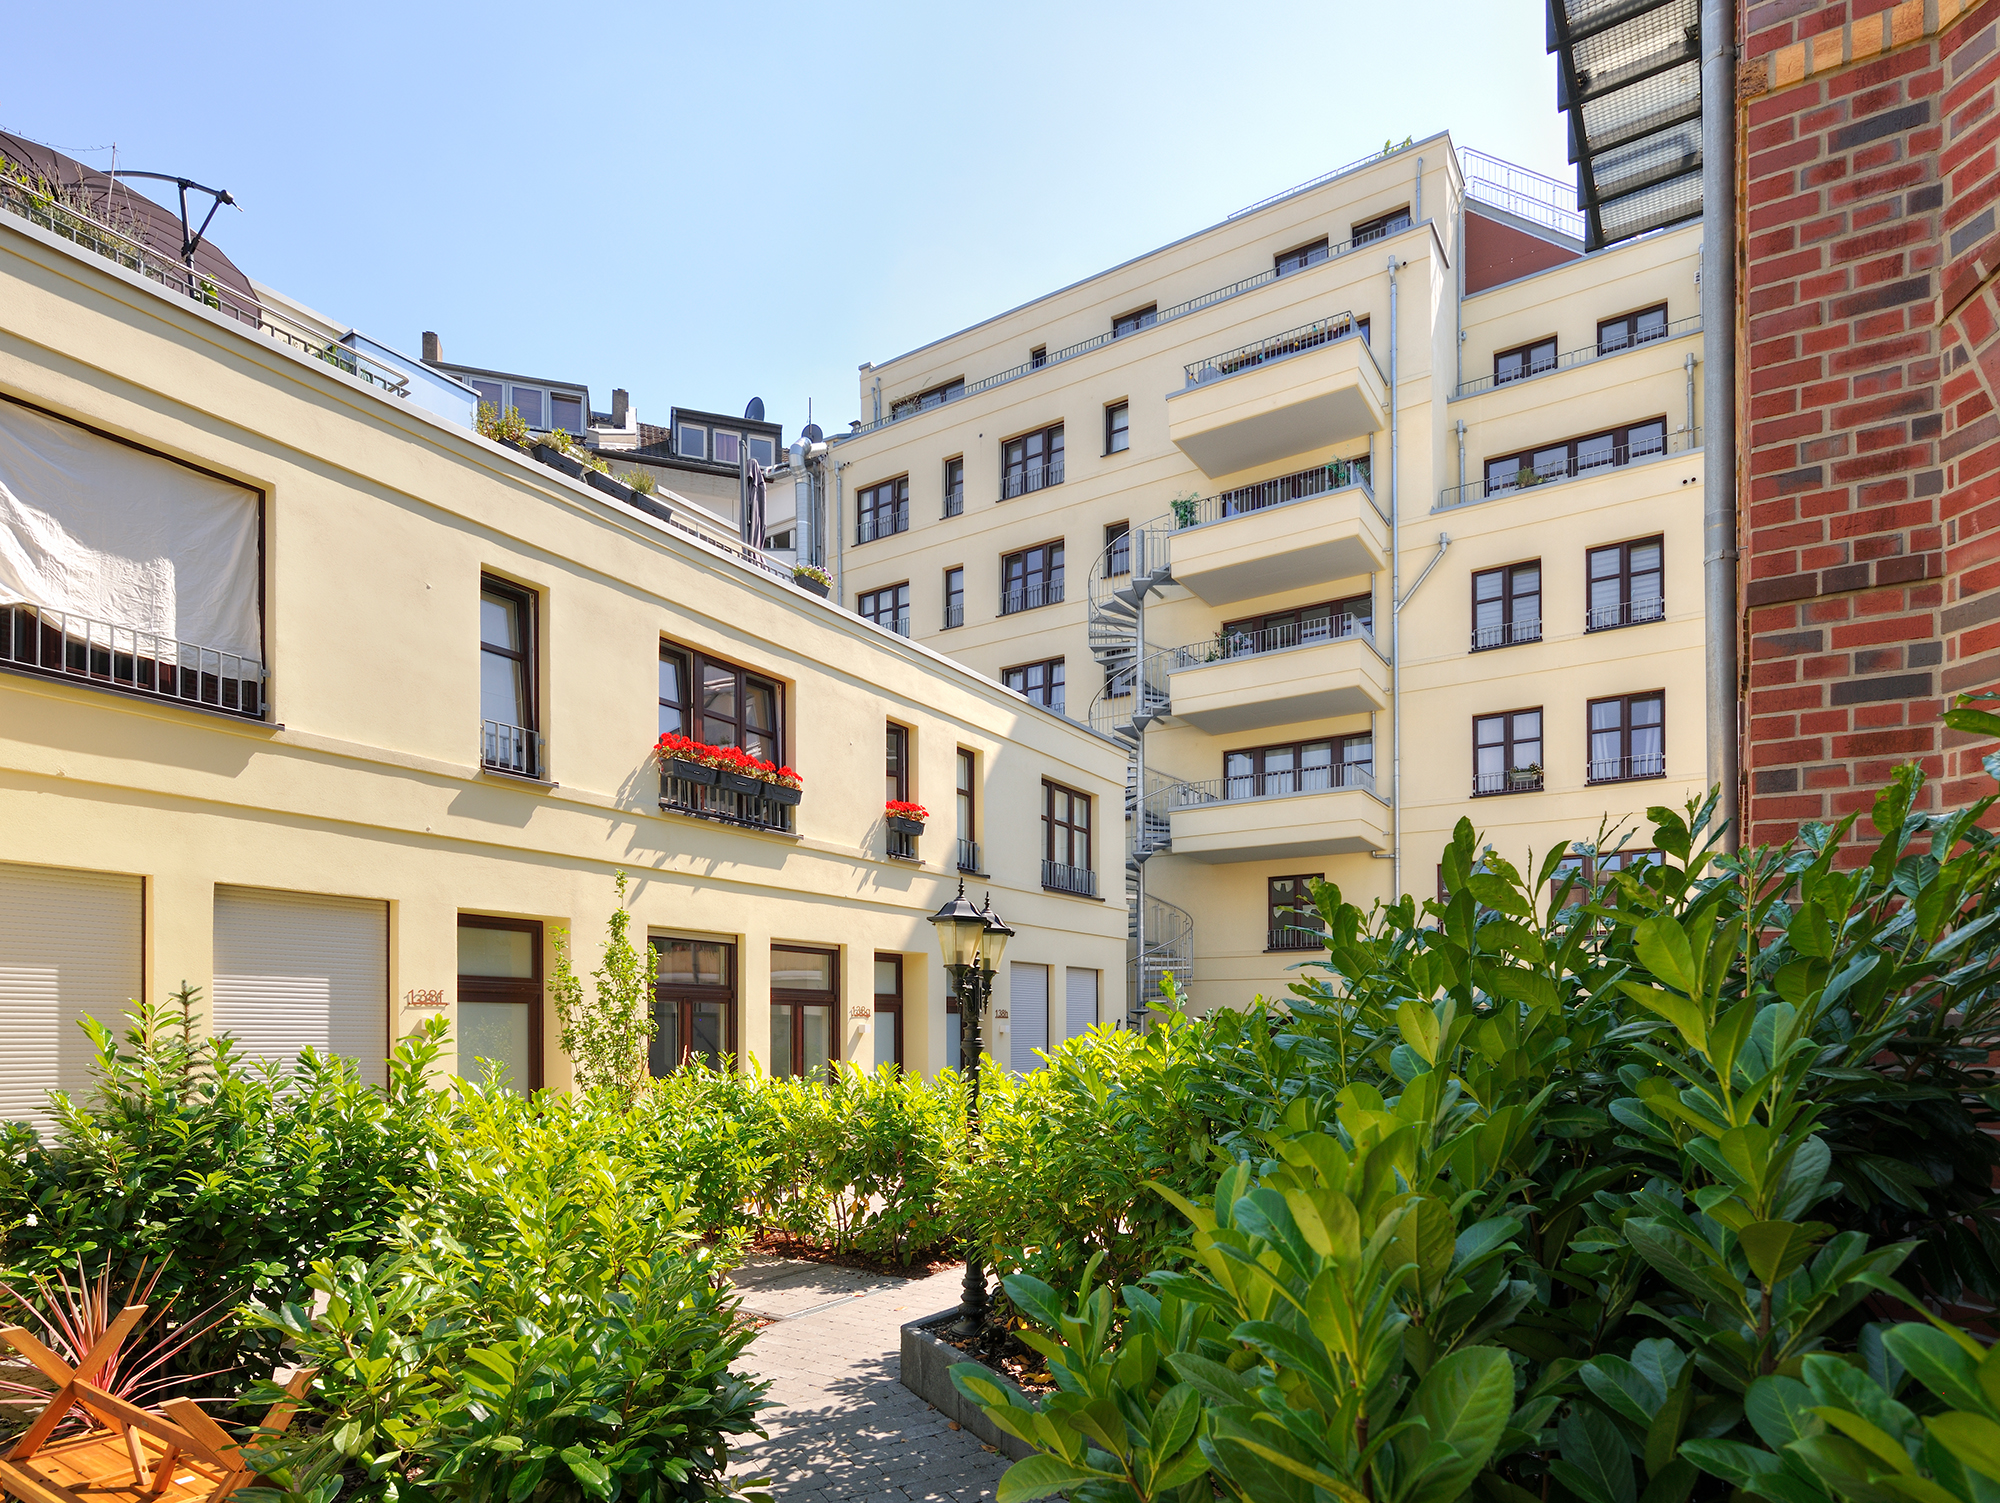 heckundschmiegel-projekte-klosterstrasse-6